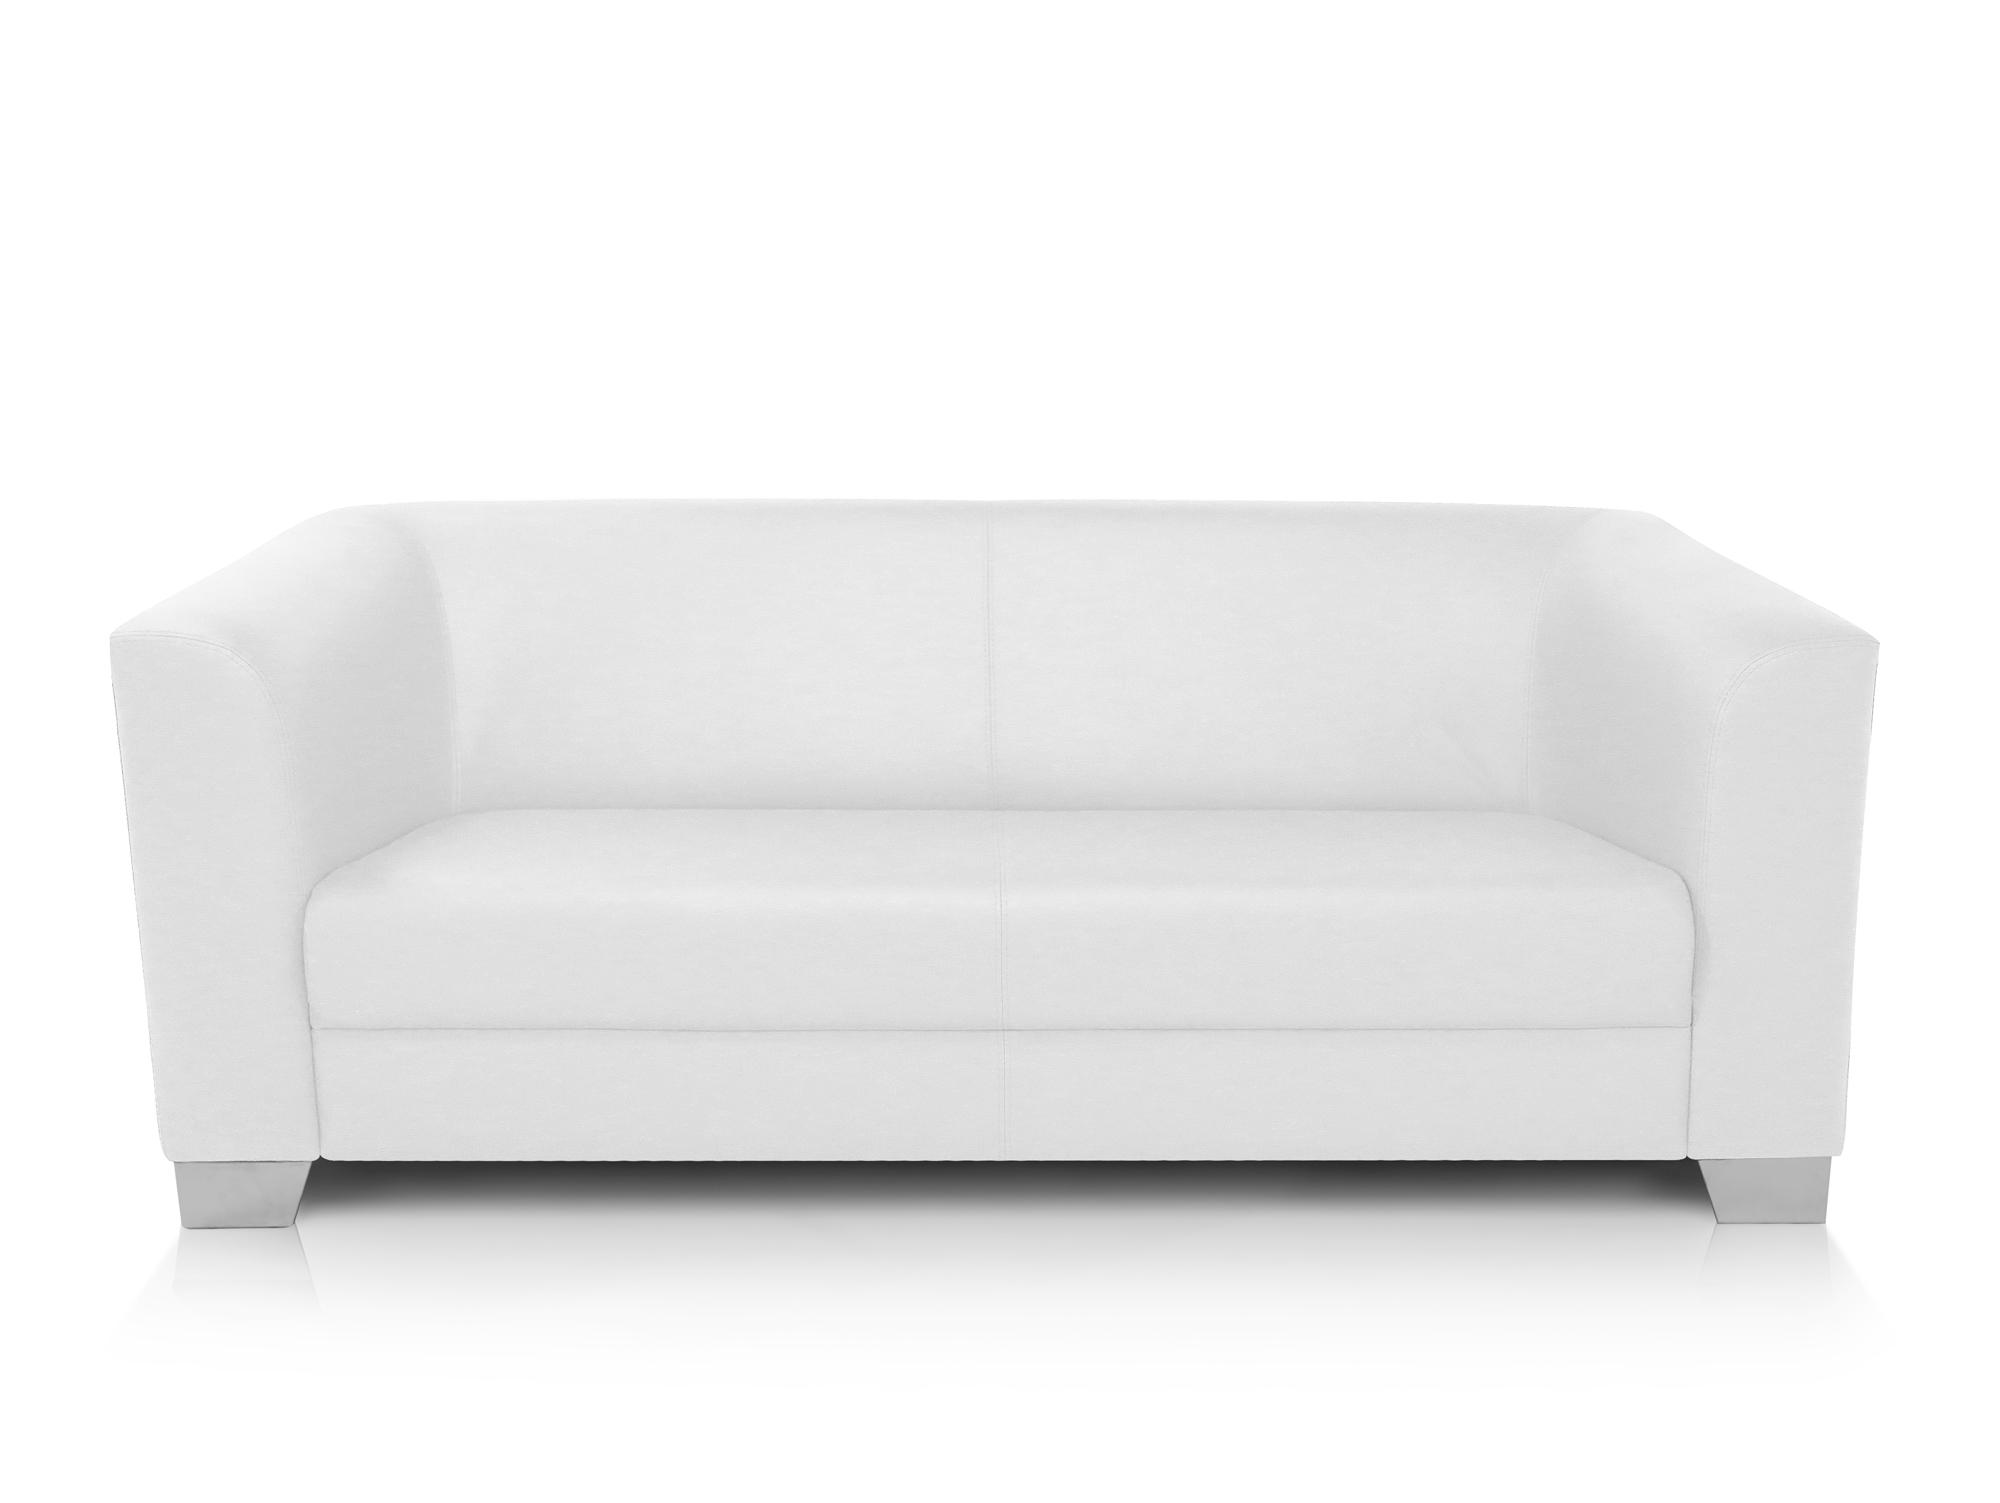 chicago 3 sitzer sofa ledersofa weiss. Black Bedroom Furniture Sets. Home Design Ideas